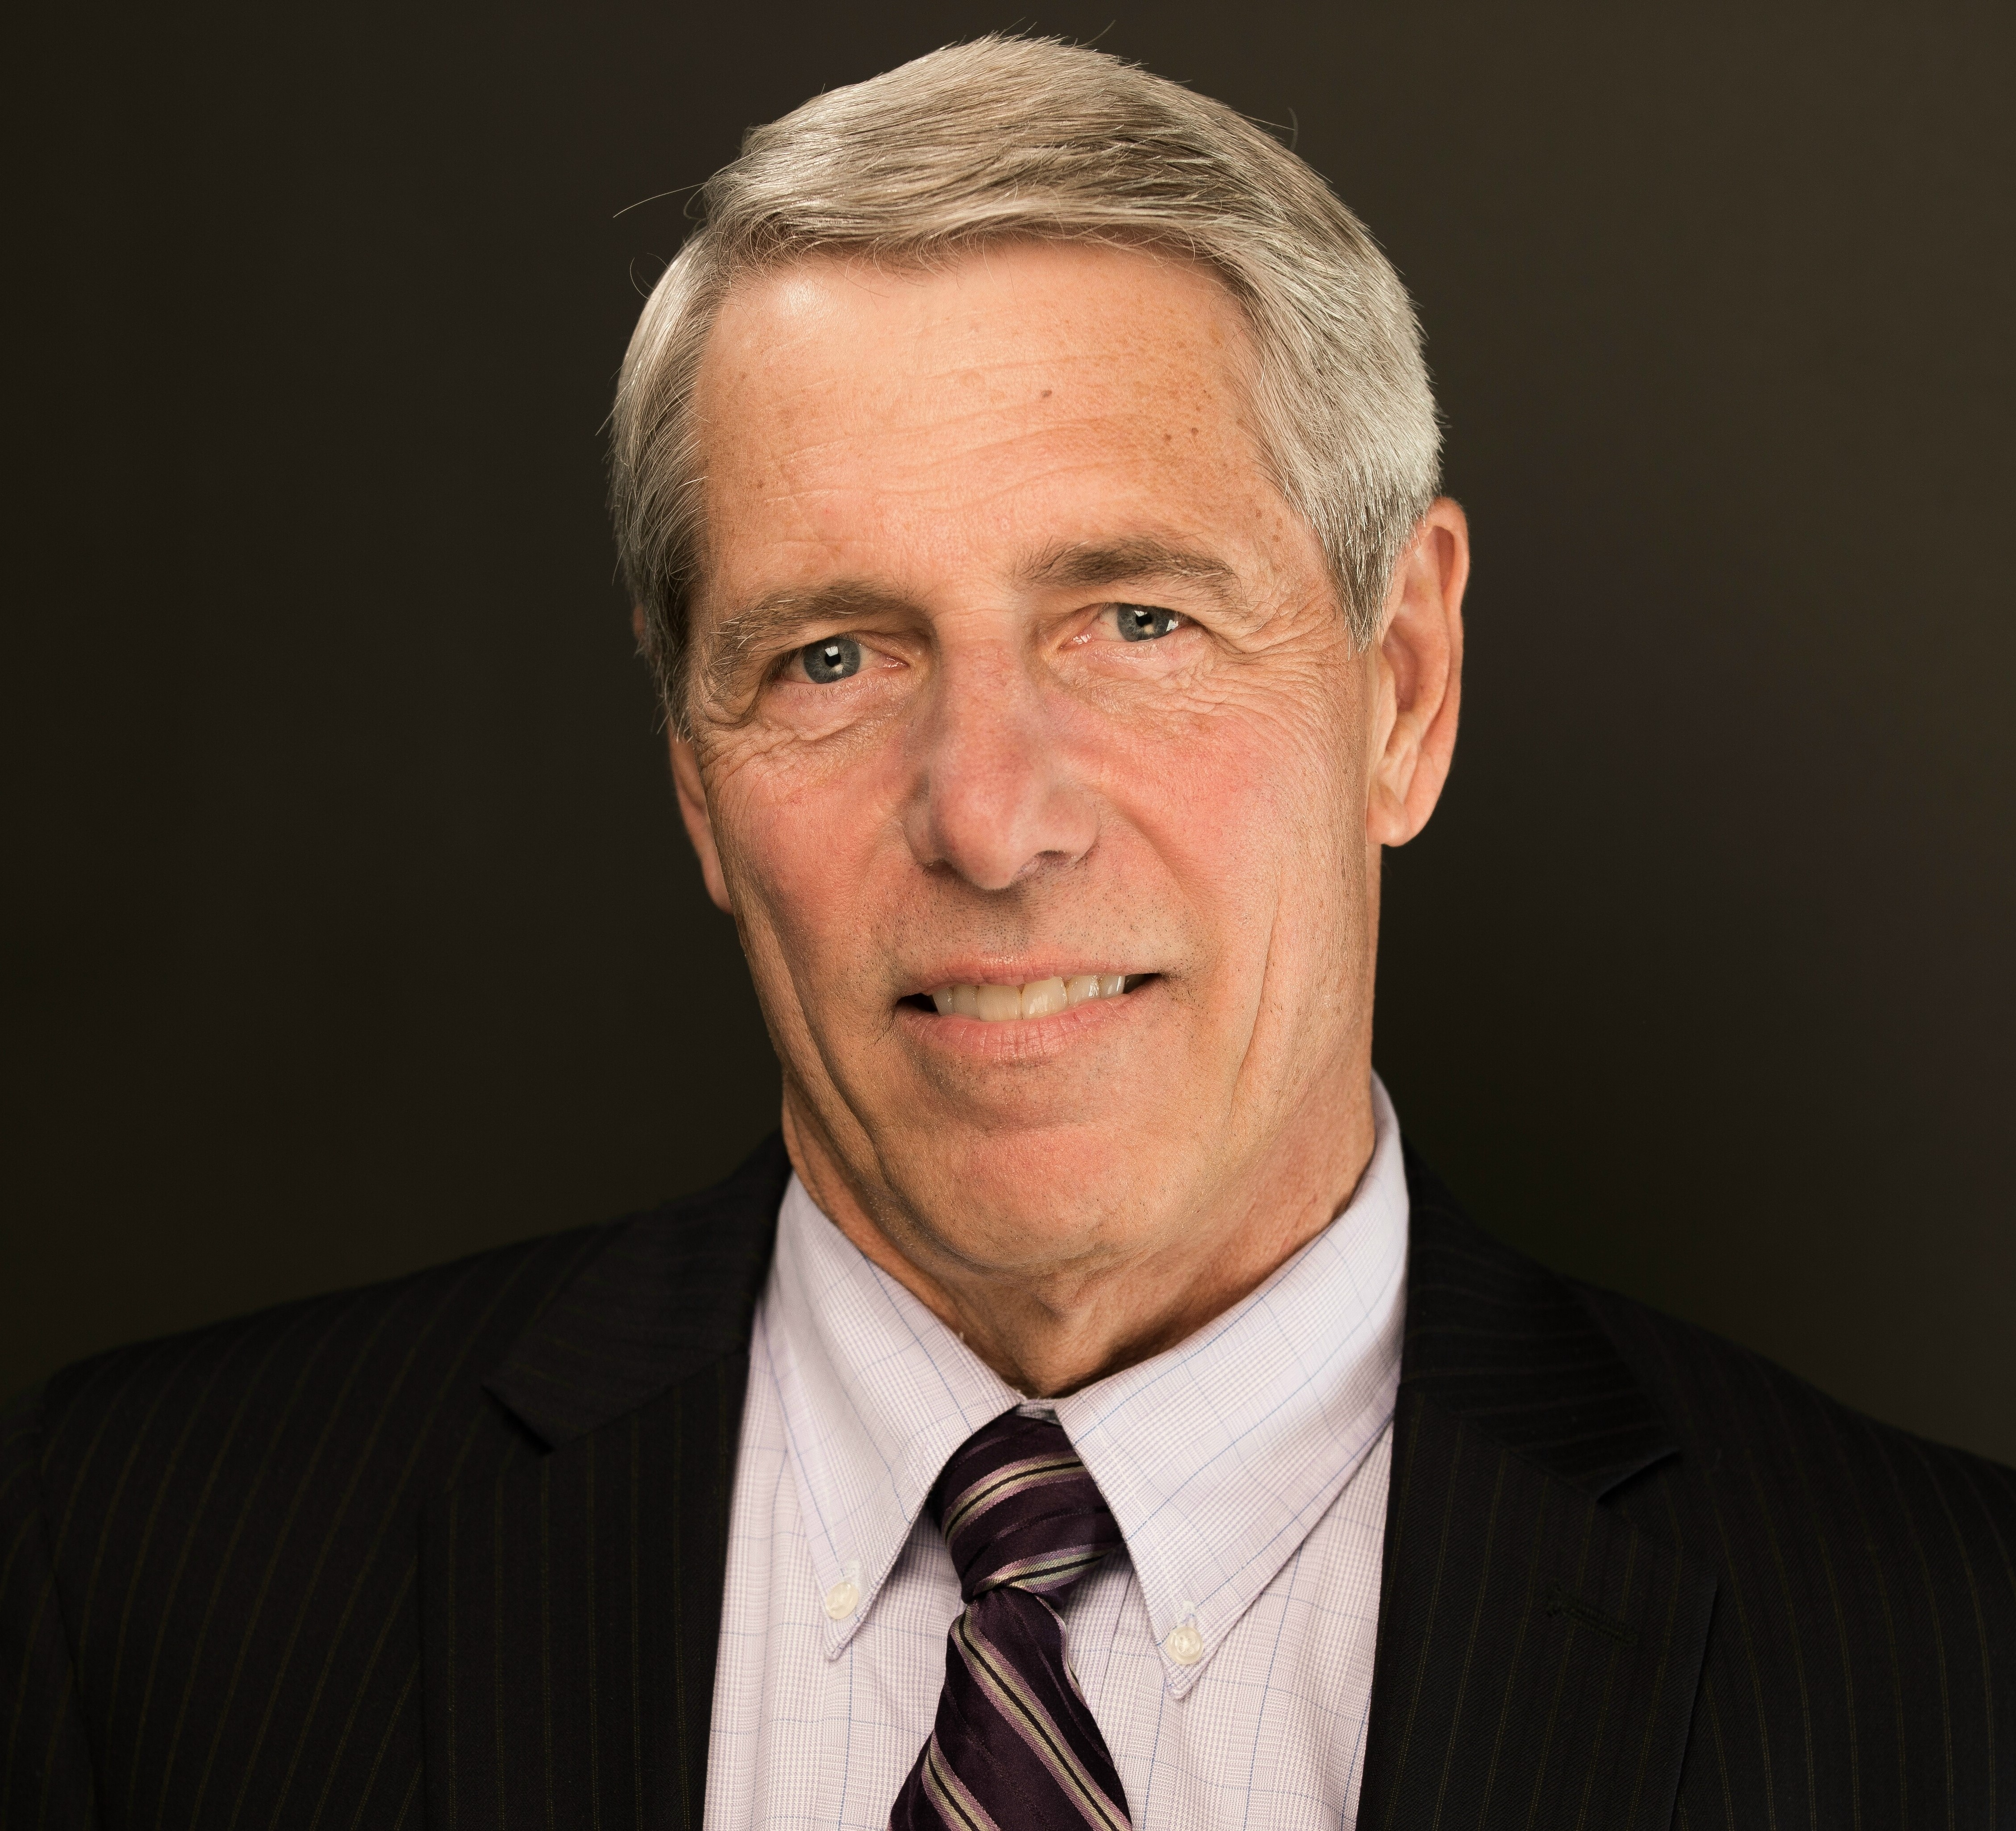 Greg Haines